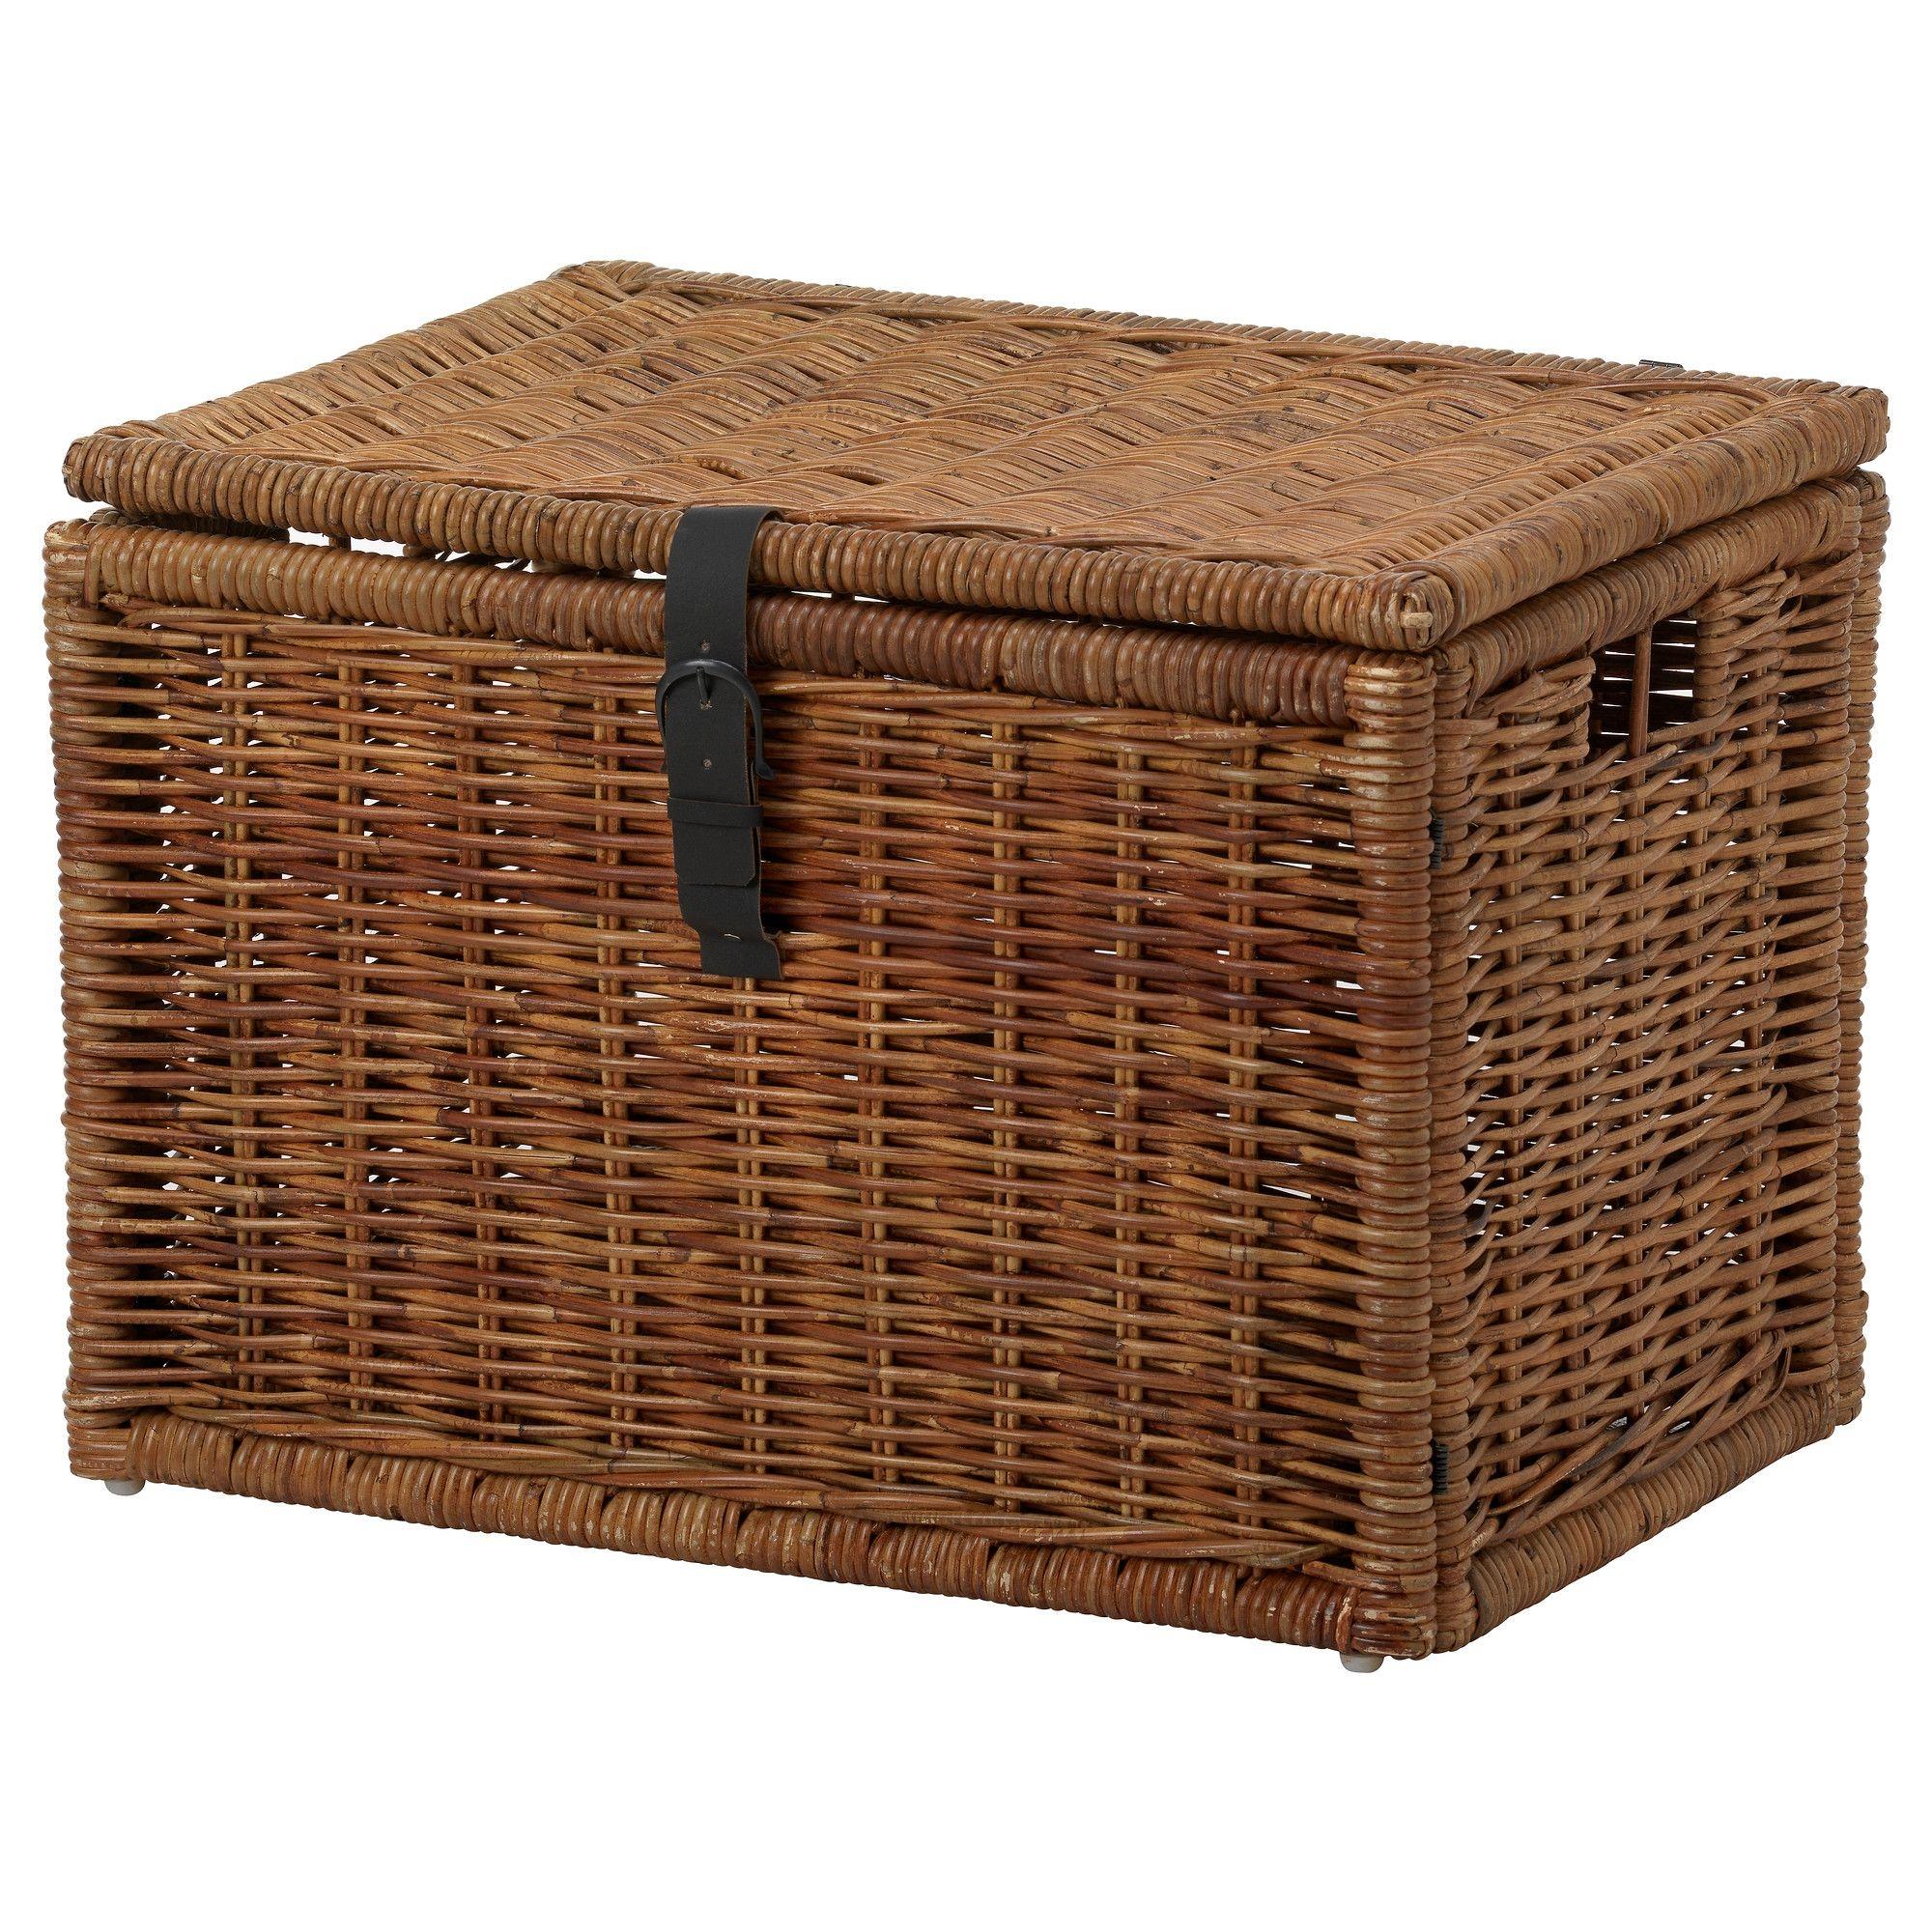 Bedroom storage chest bench  sc 1 st  Foter & End Of Bed Storage Chest - Foter